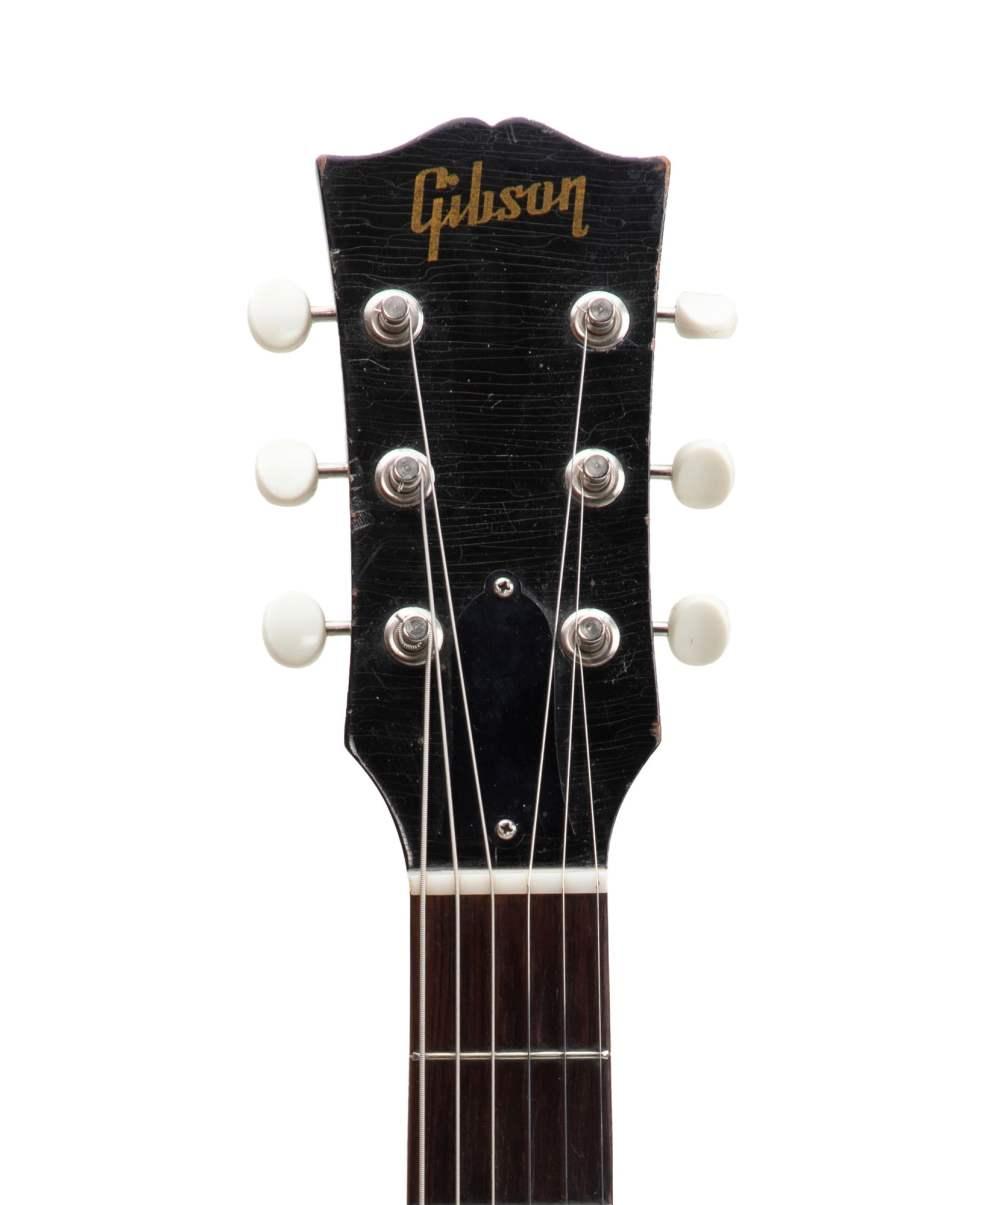 medium resolution of original 1952 gibson es 125 in black finish u2013 guitarhunter dkoriginal 1952 gibson es 125